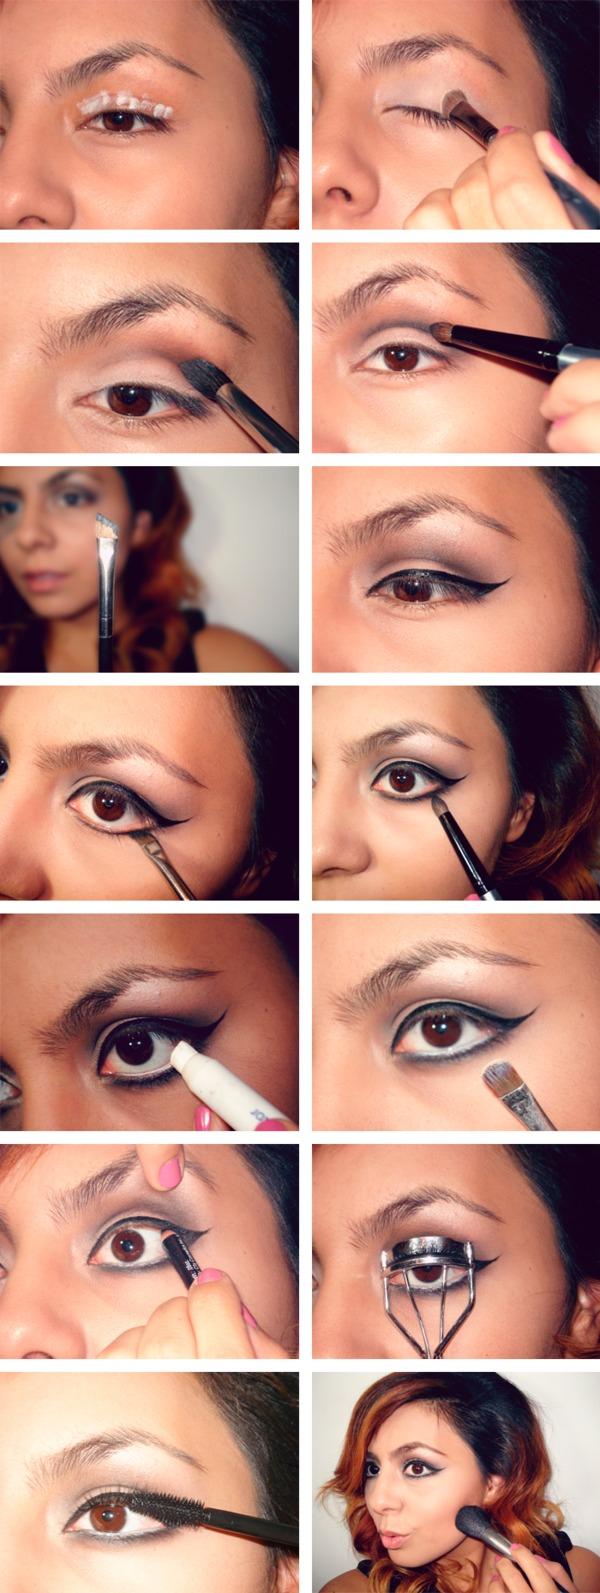 lana del rey makeup how to - photo #31